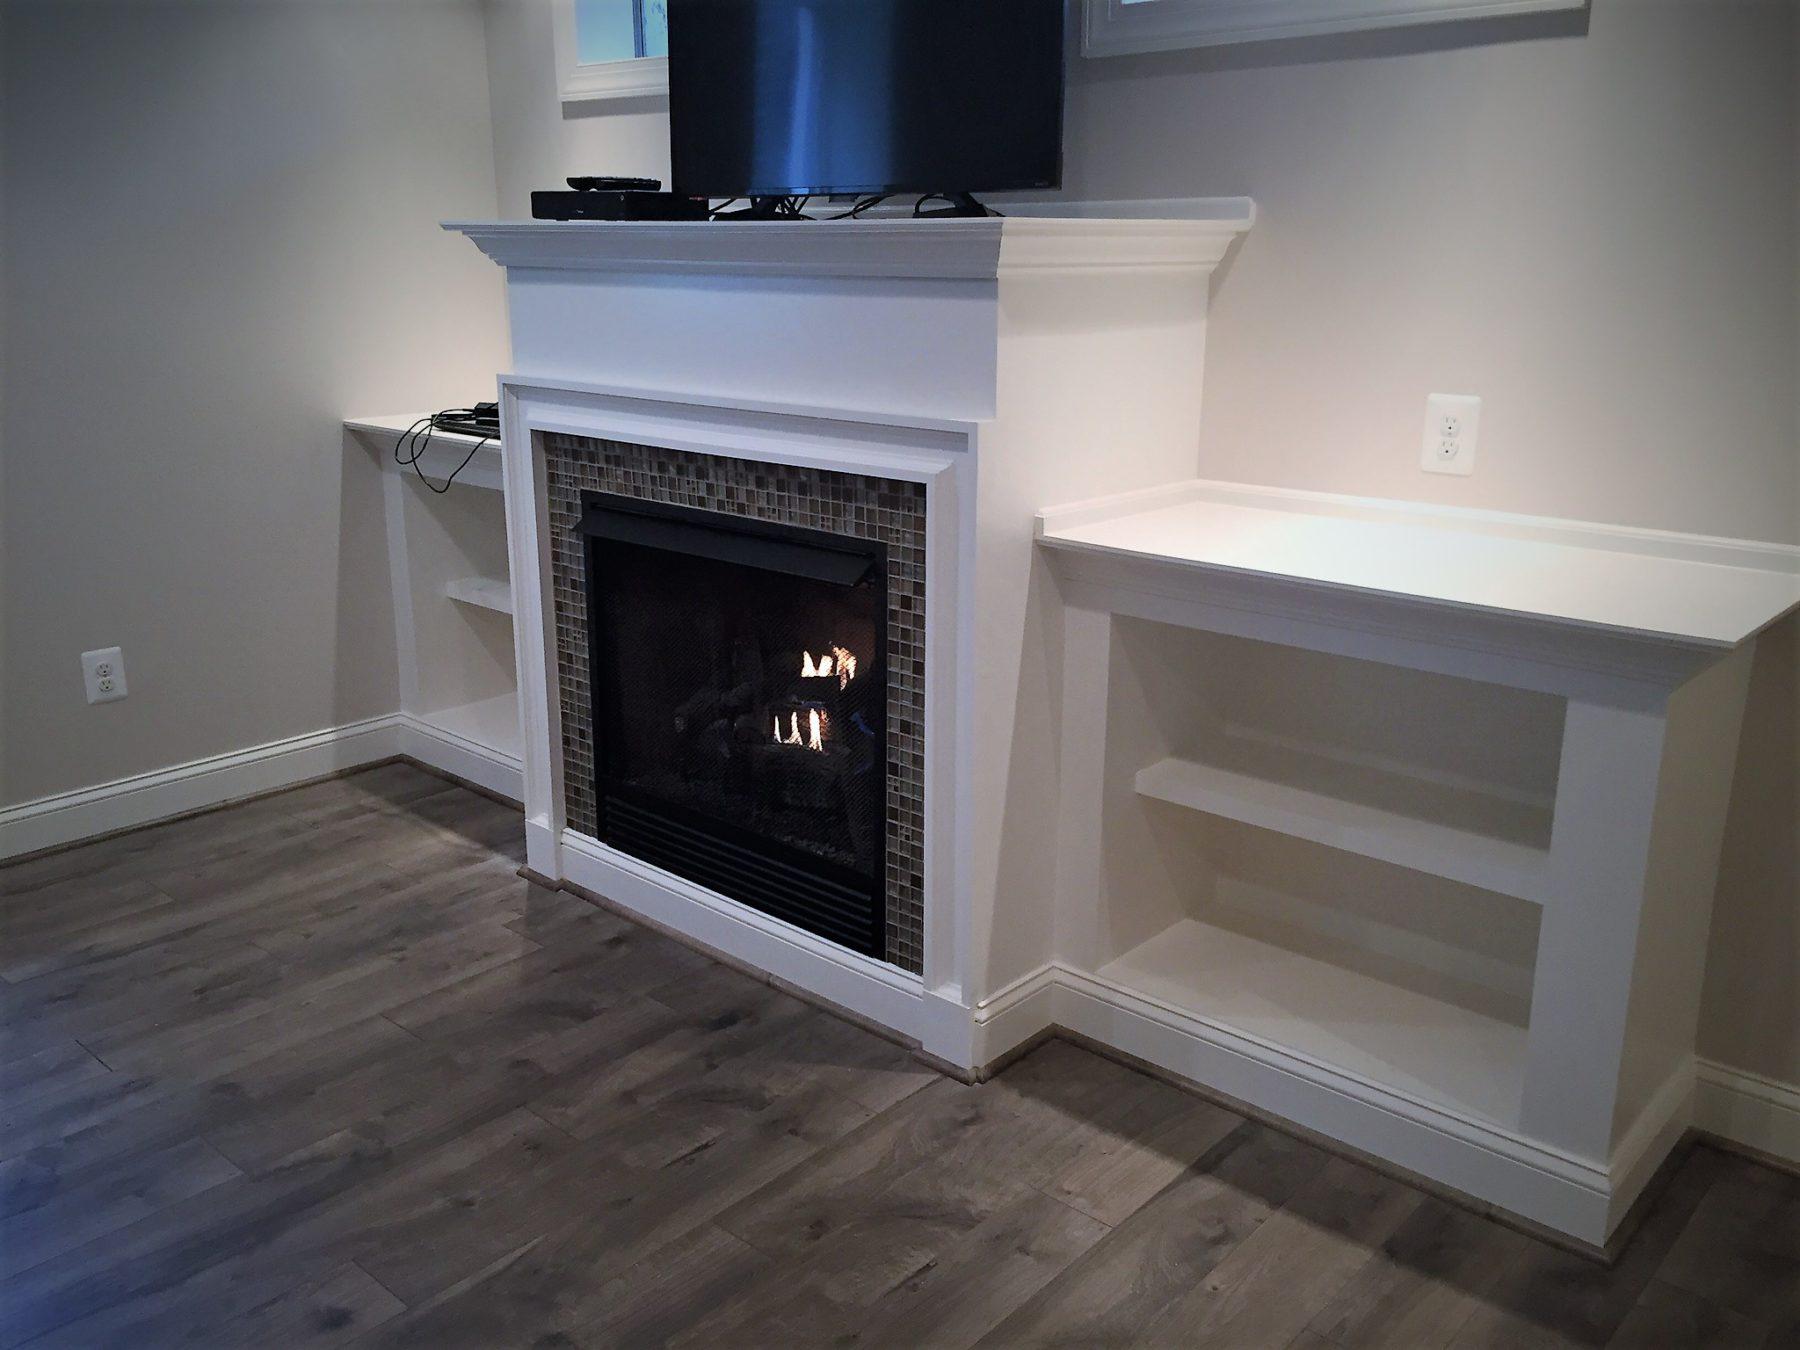 Basement Remodeler basement remodeling contractor vienna va | bianco renovations